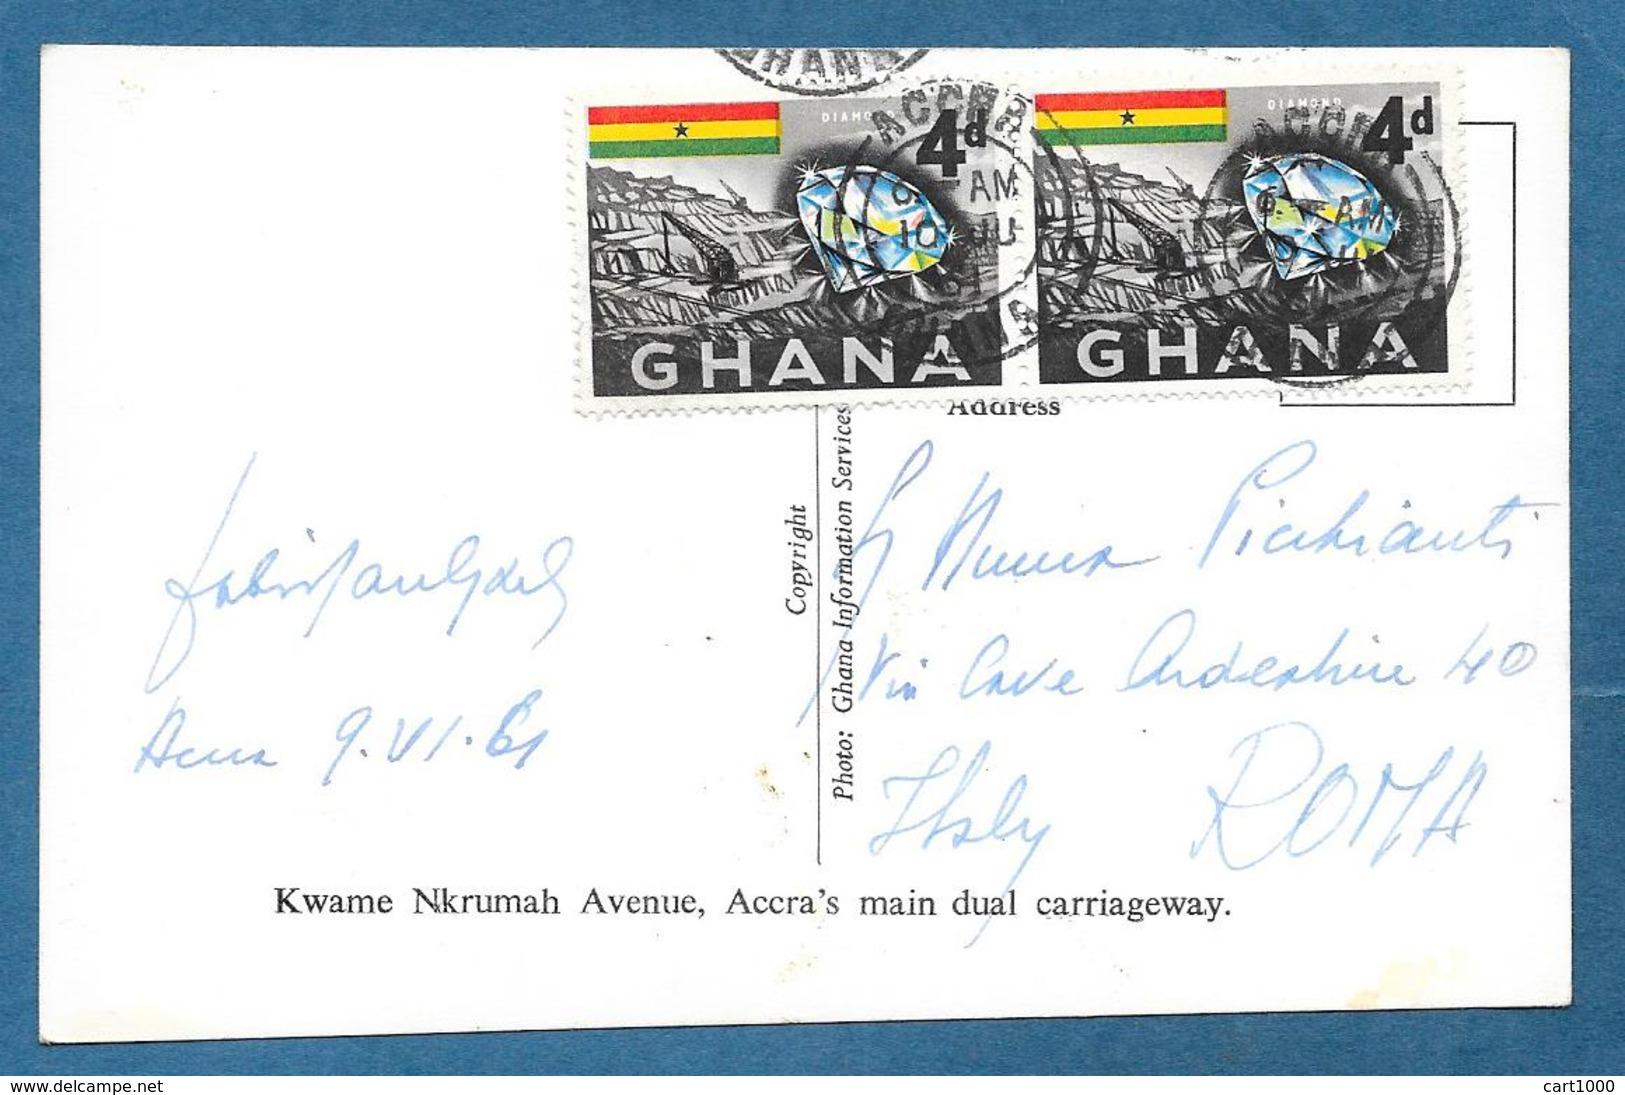 GHANA KWAME NKRUMAH AVENUE ACCRA'S MAIN DUAL CARRIAGEWAY 1961 - Ghana - Gold Coast